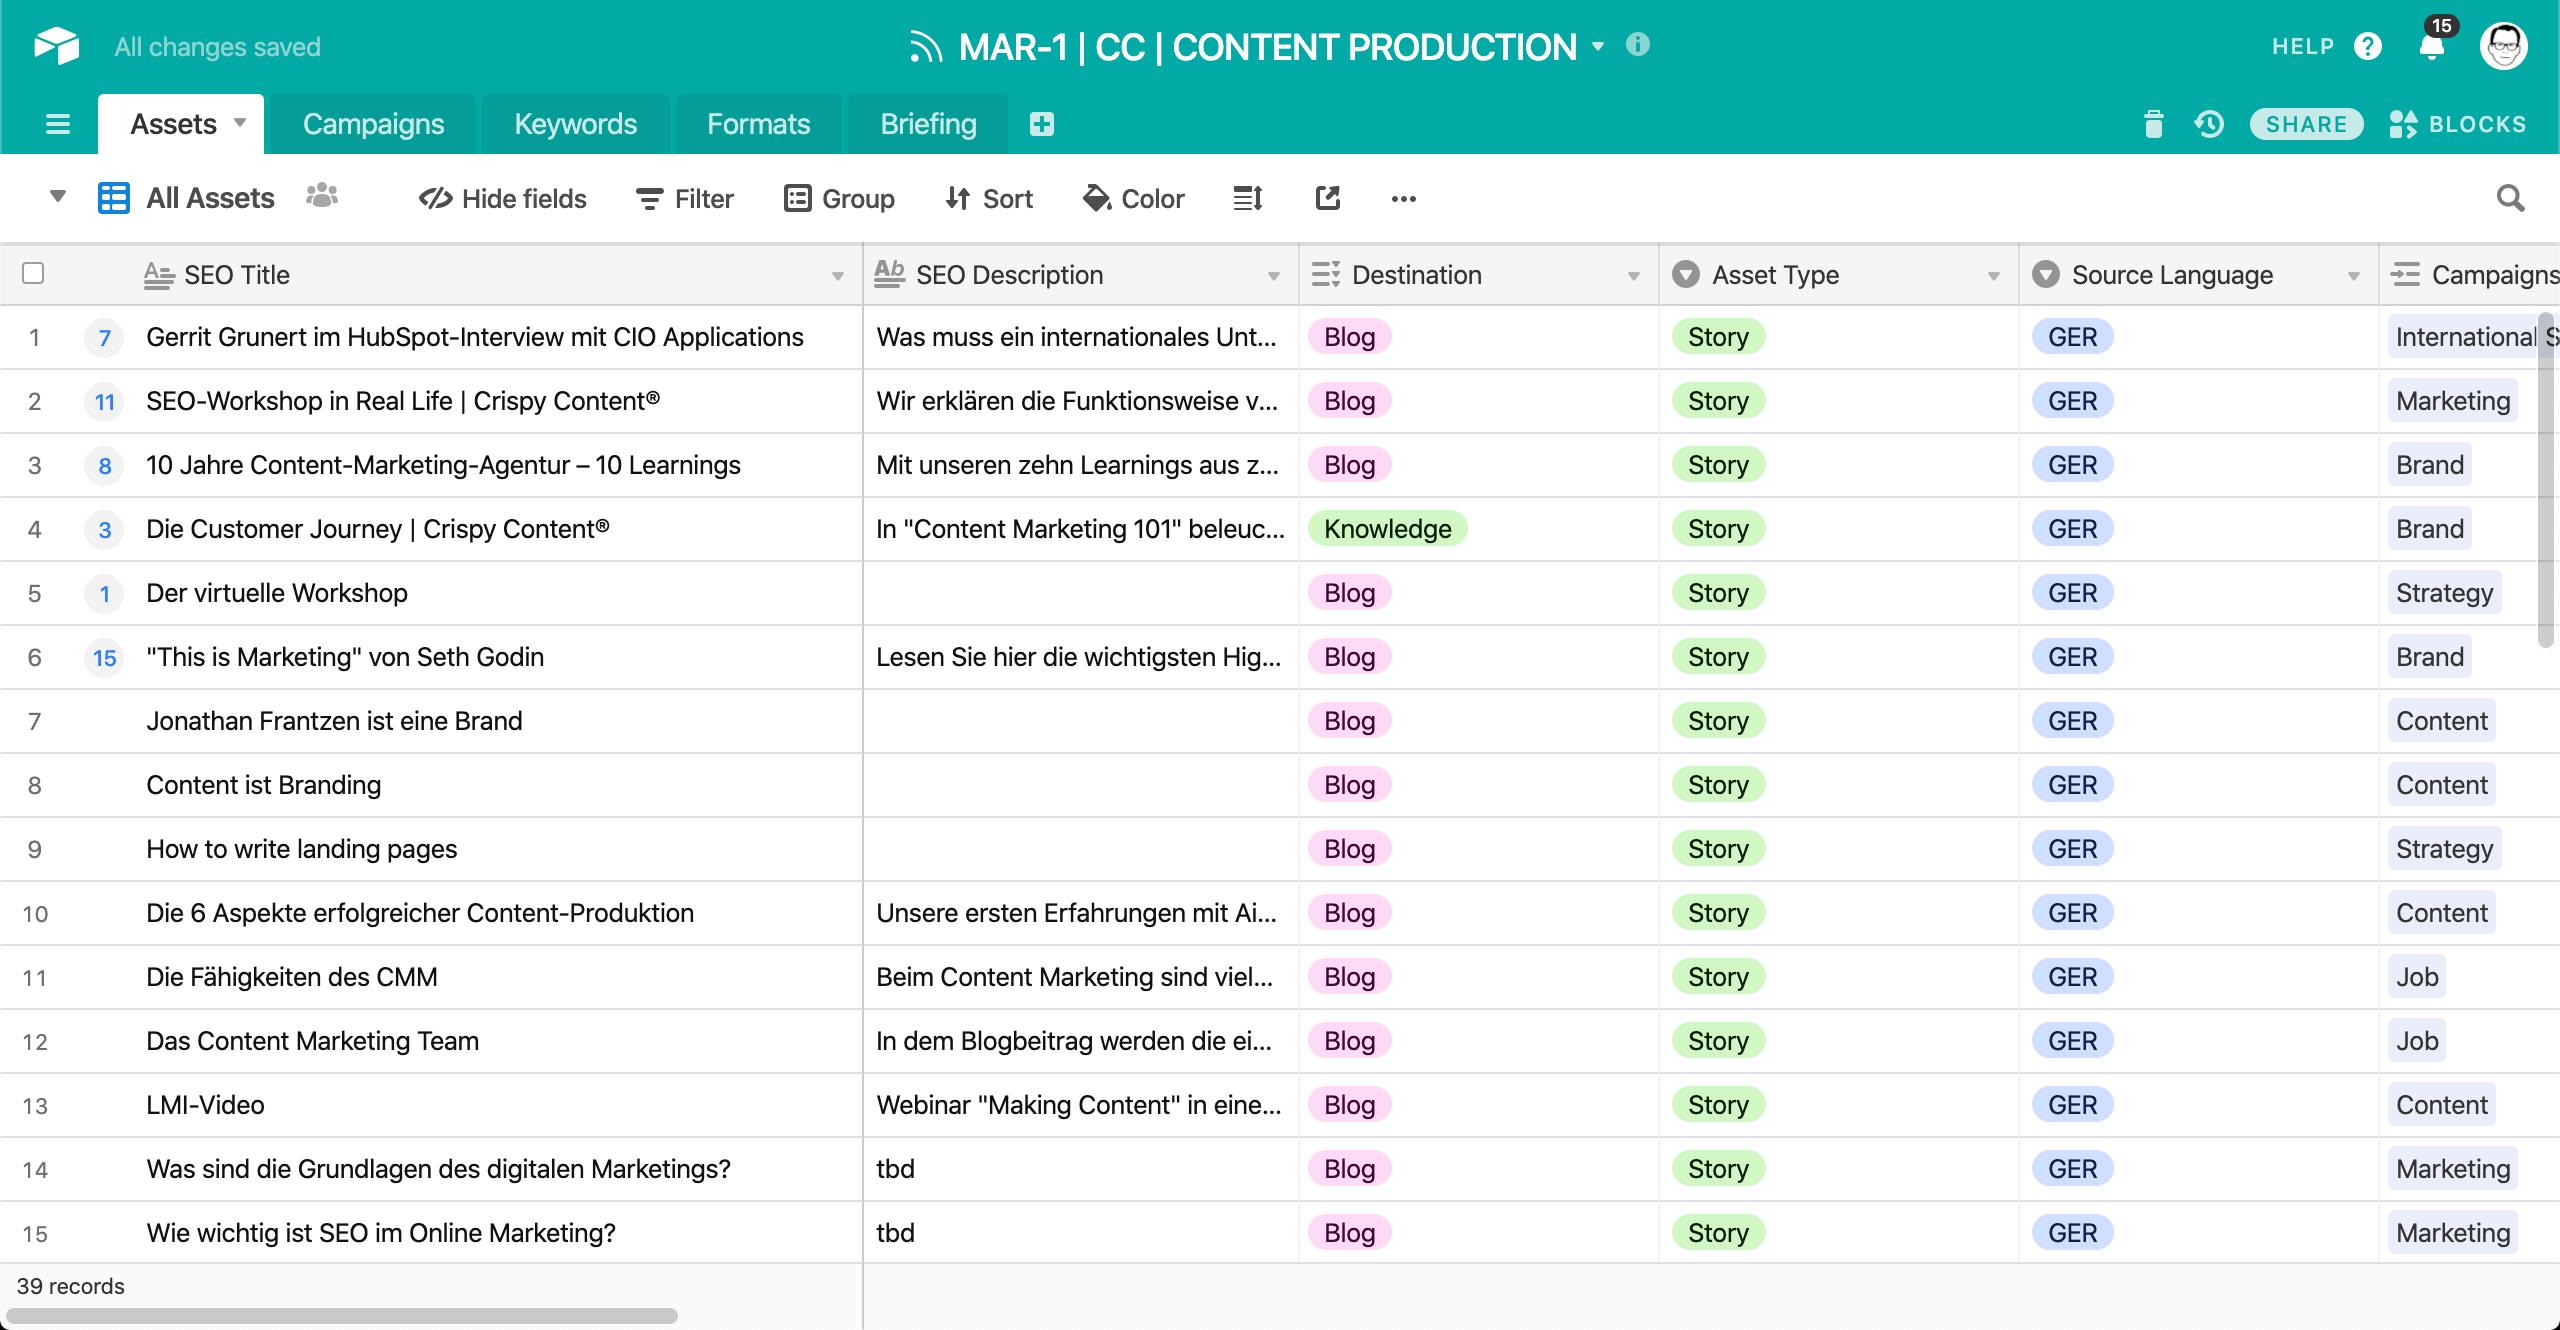 Content Asset Spreadsheet, Airtable